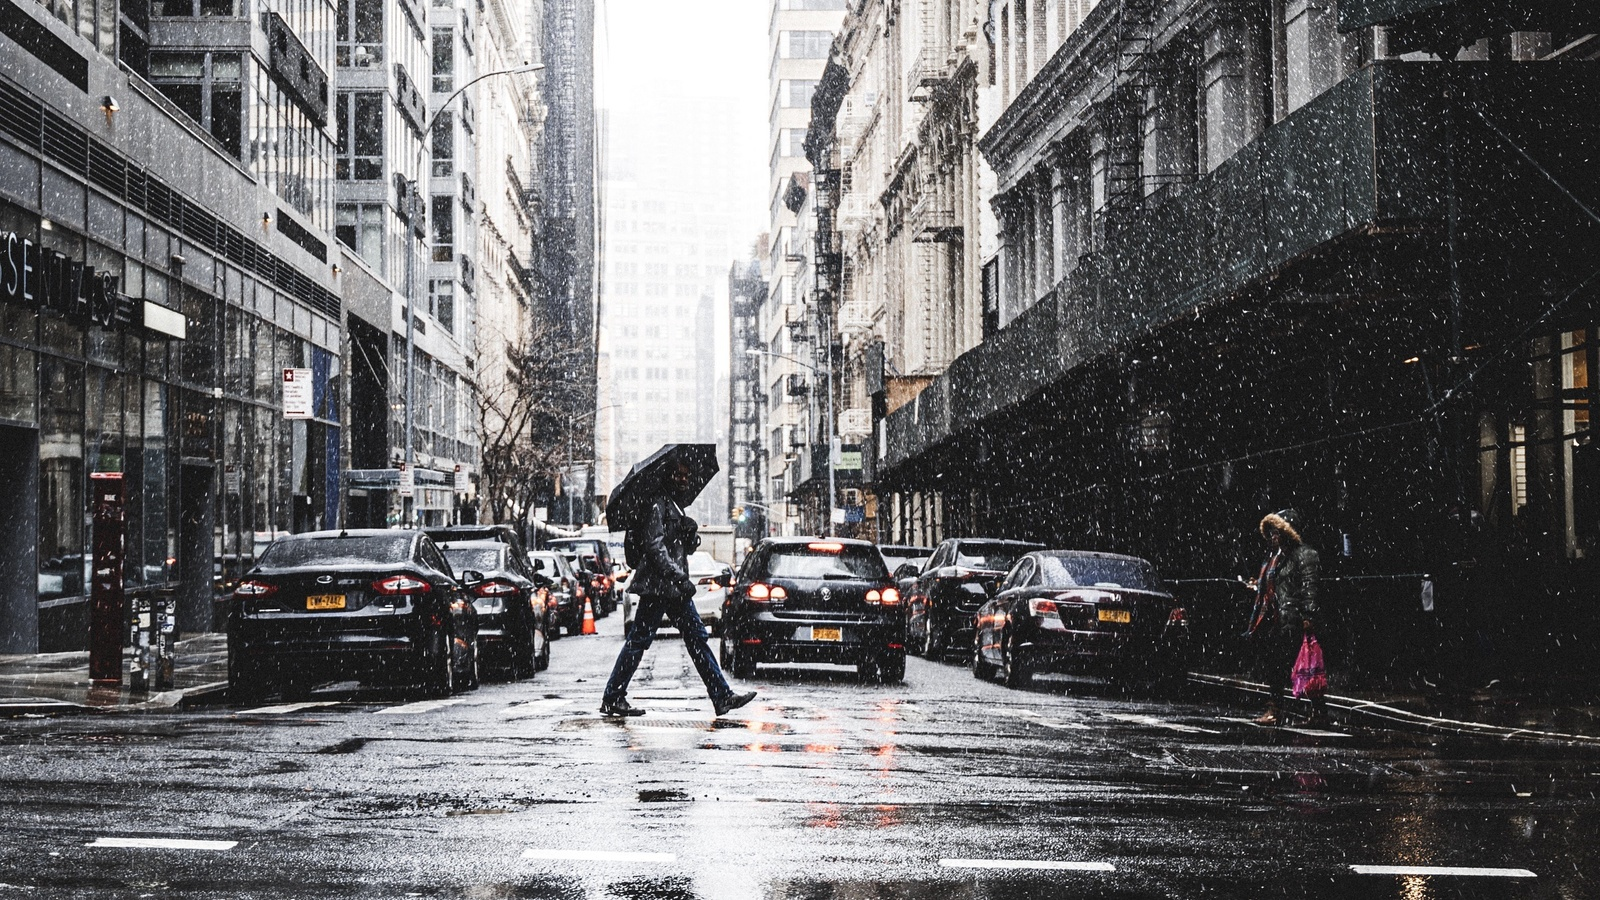 new york, morning, manhattan, winter, rain, buildings